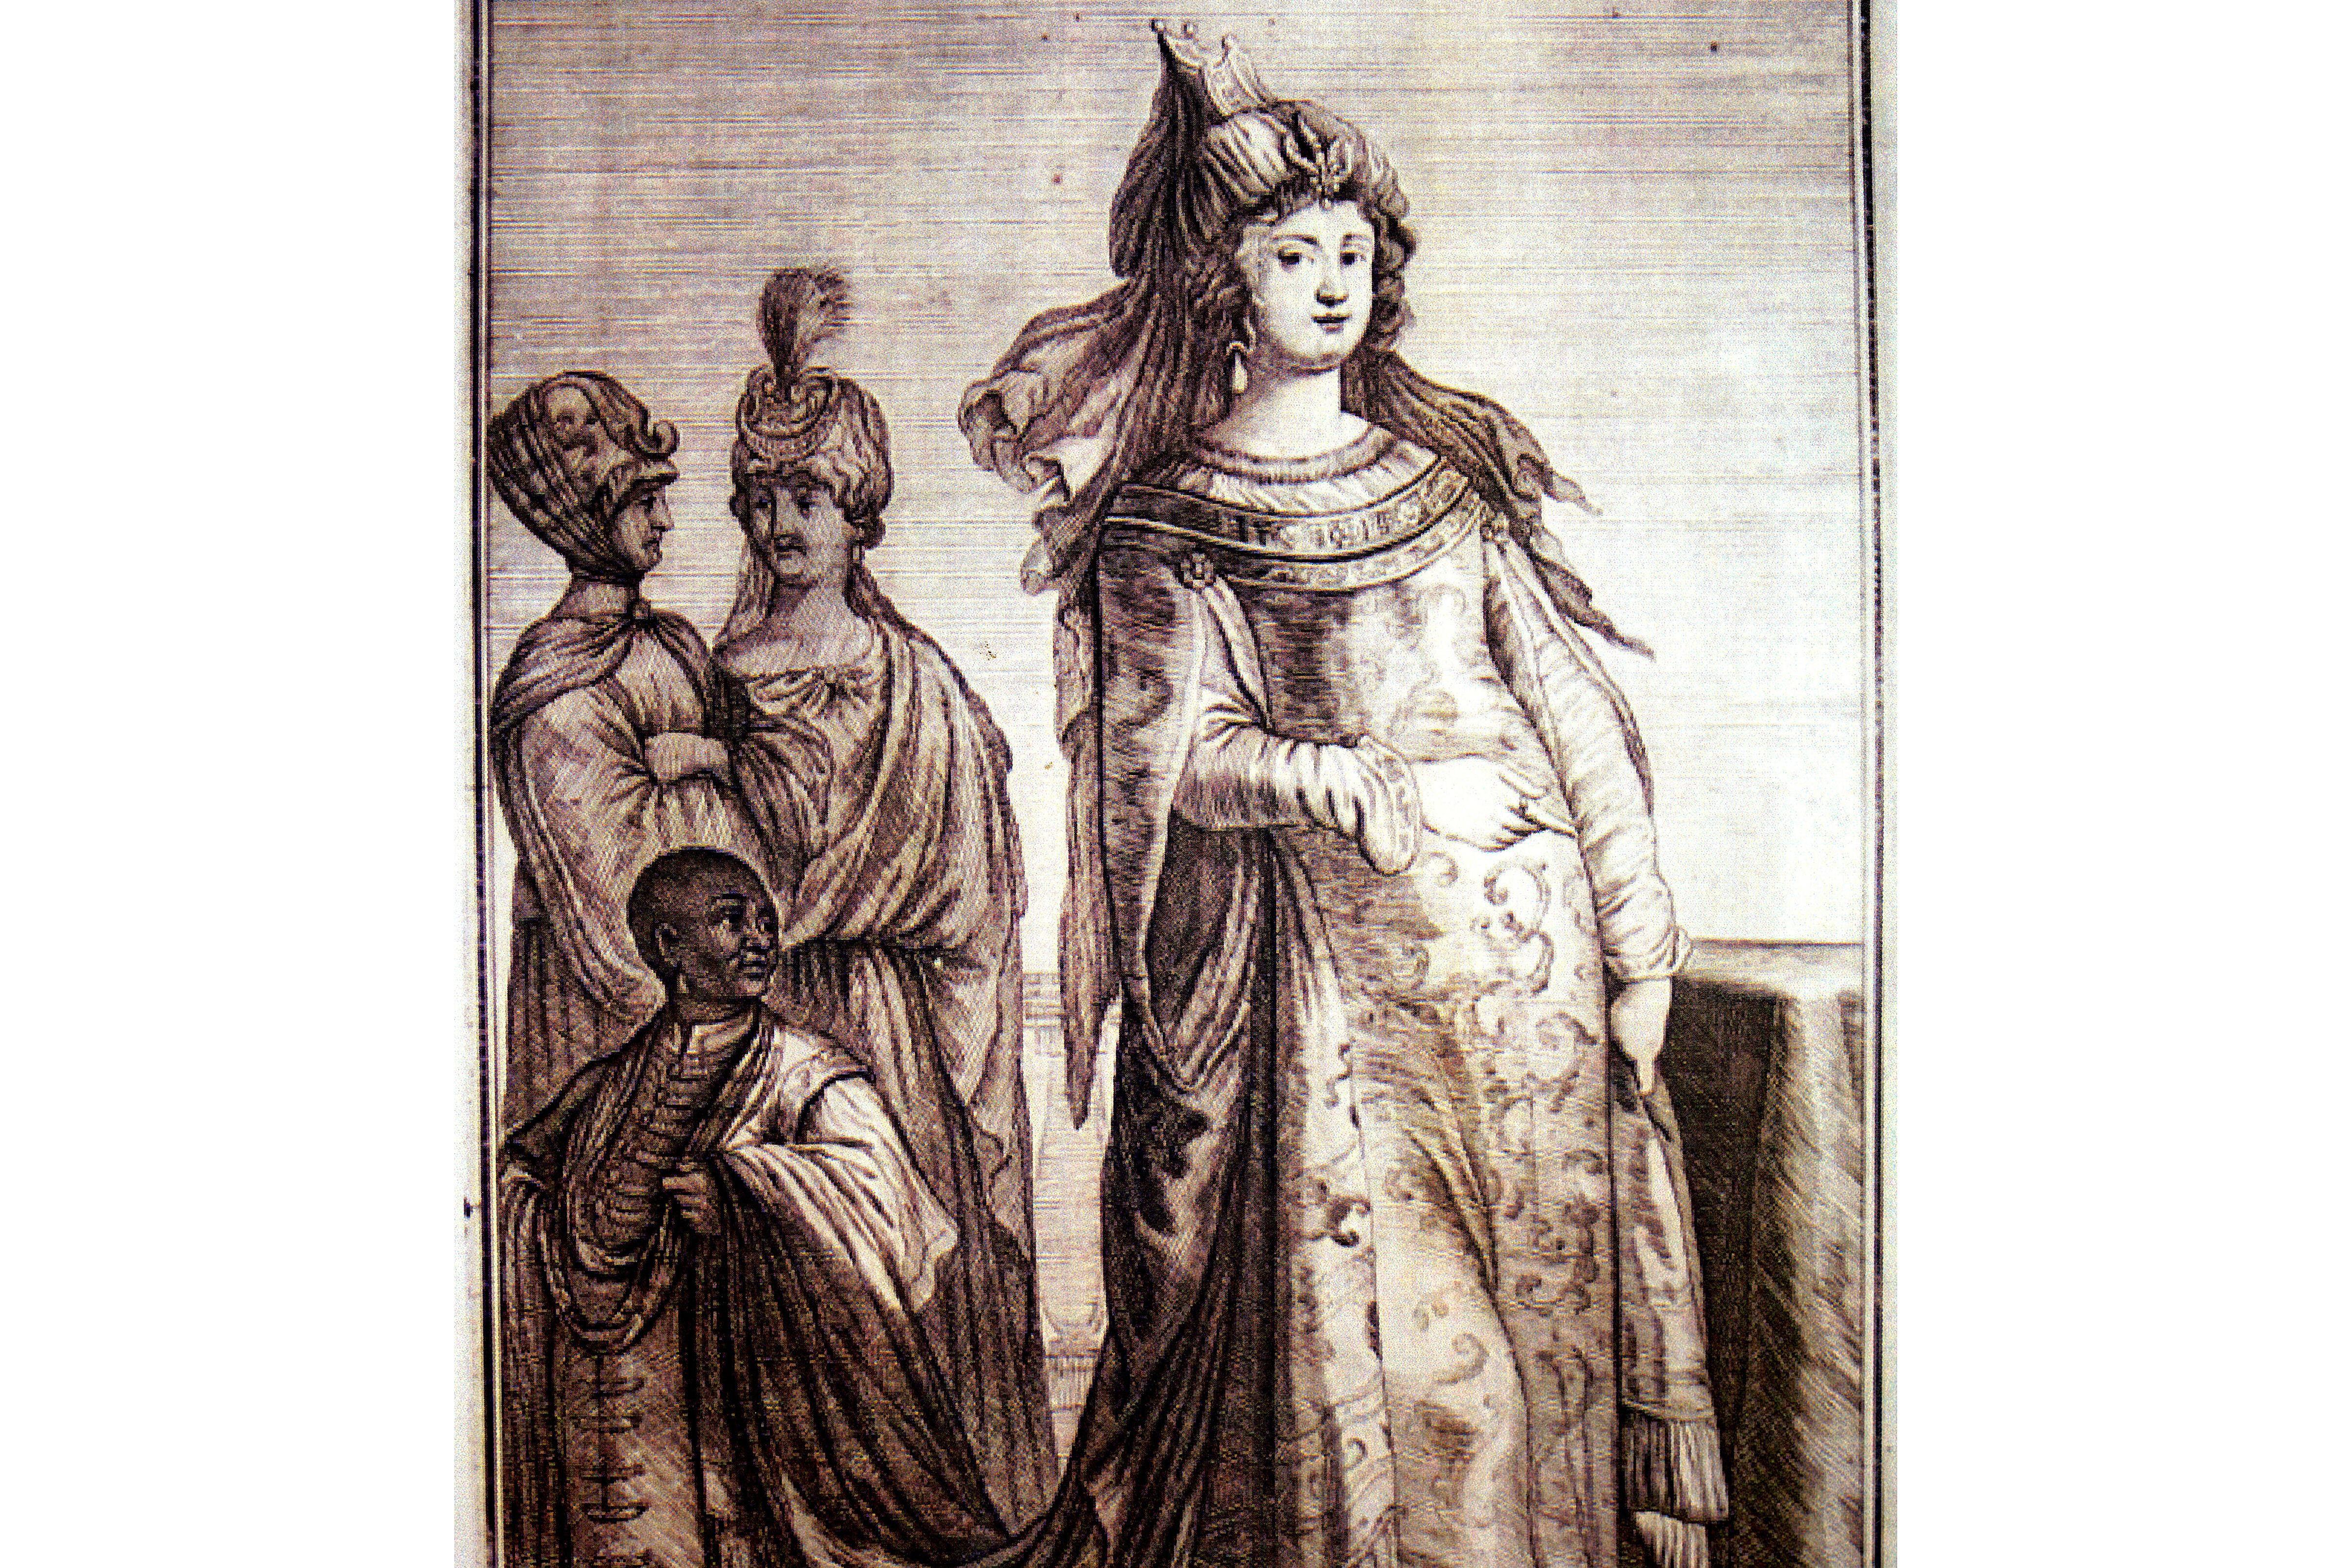 Mehpeyker Sultan with servants